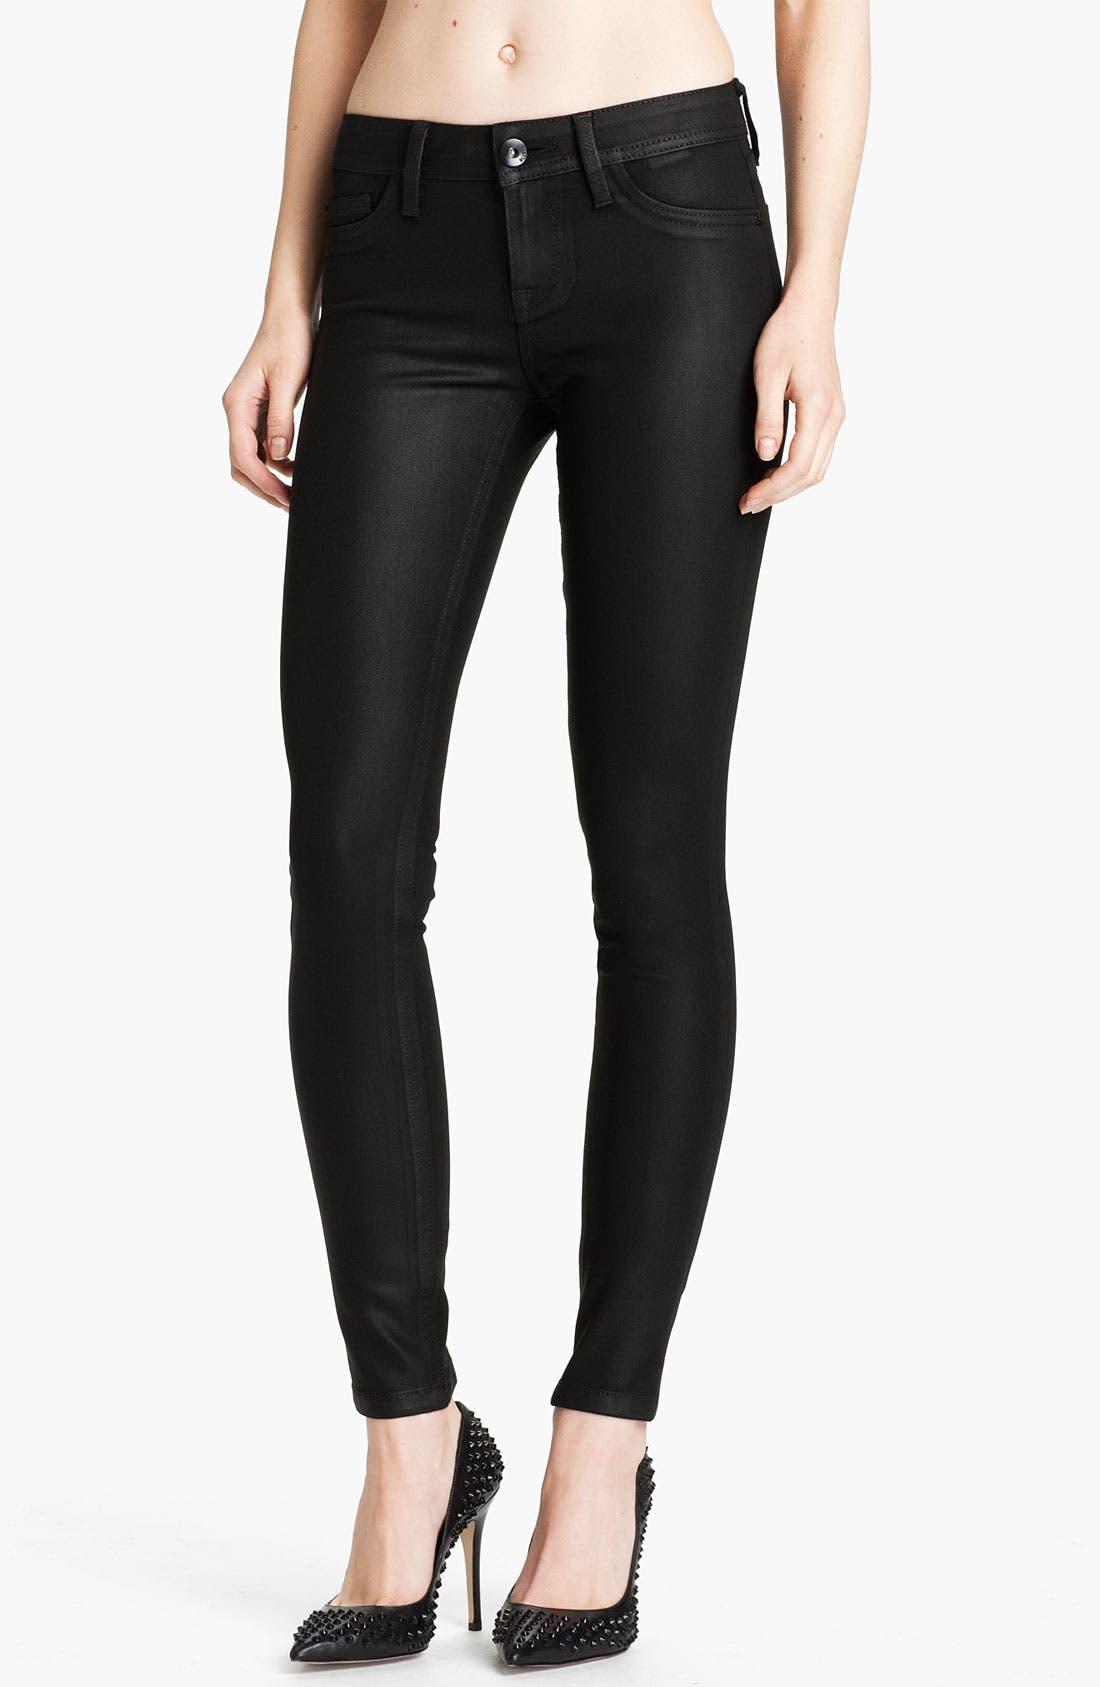 Main Image - DL1961 'Amanda' Coated Denim Skinny Jeans (Hematite)